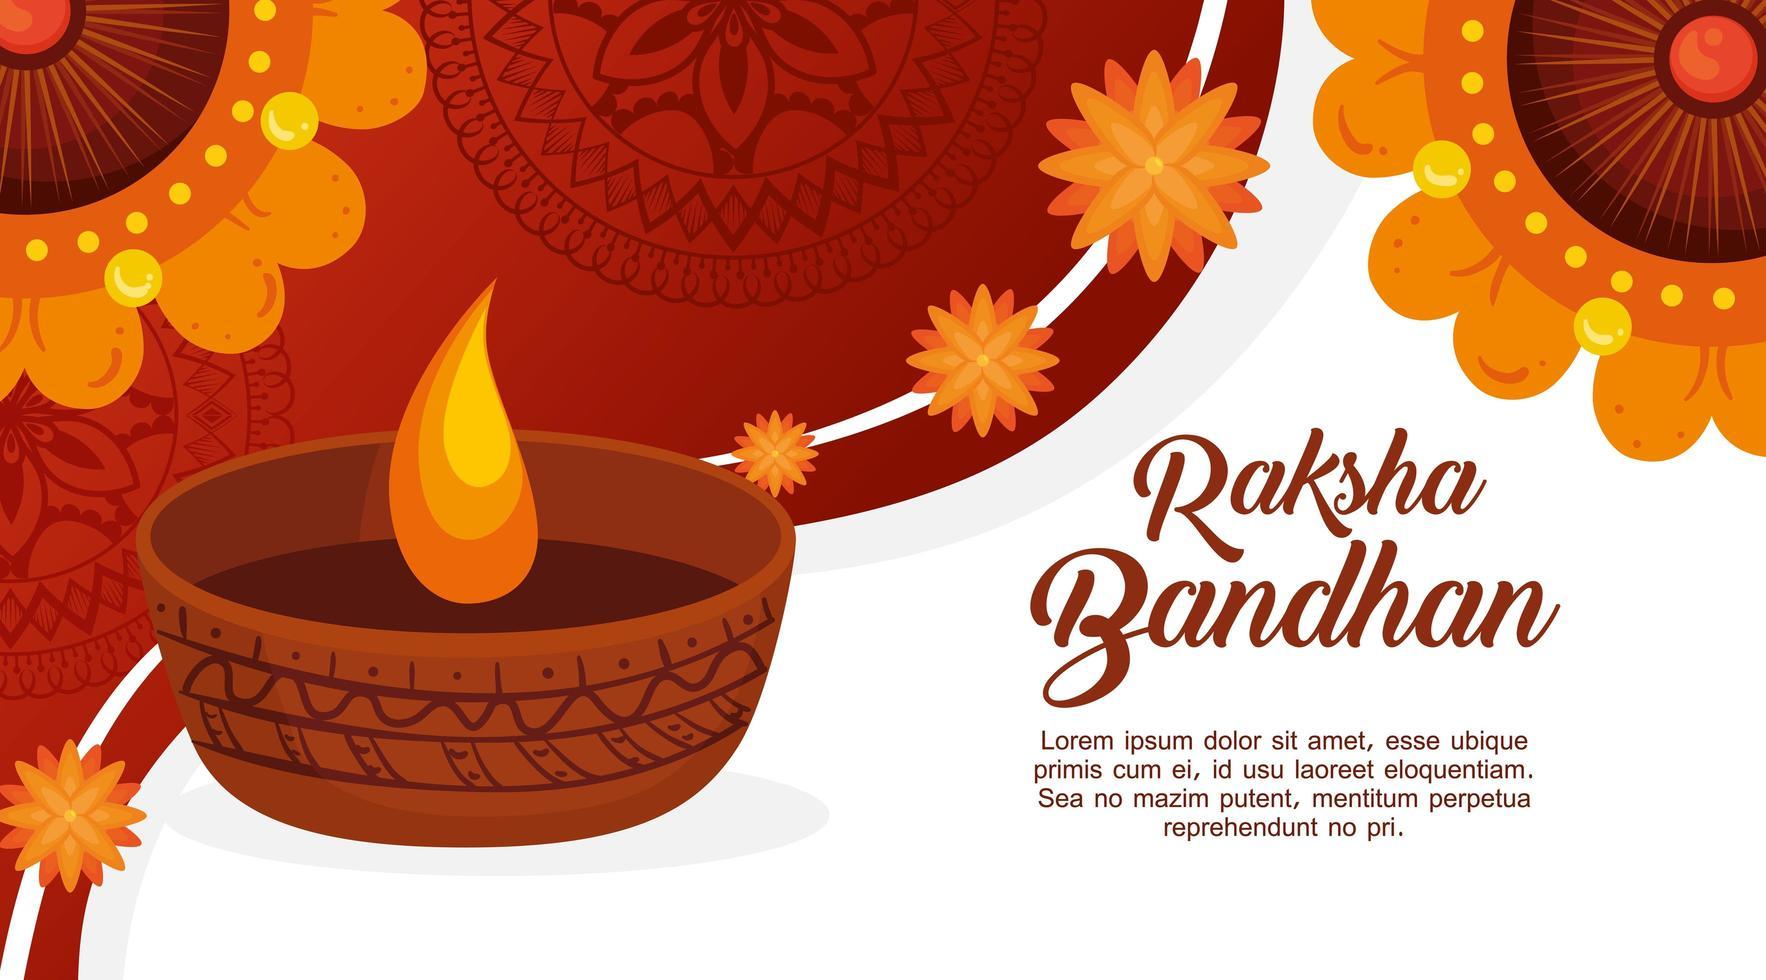 wenskaartsjabloon voor raksha bandhan vector